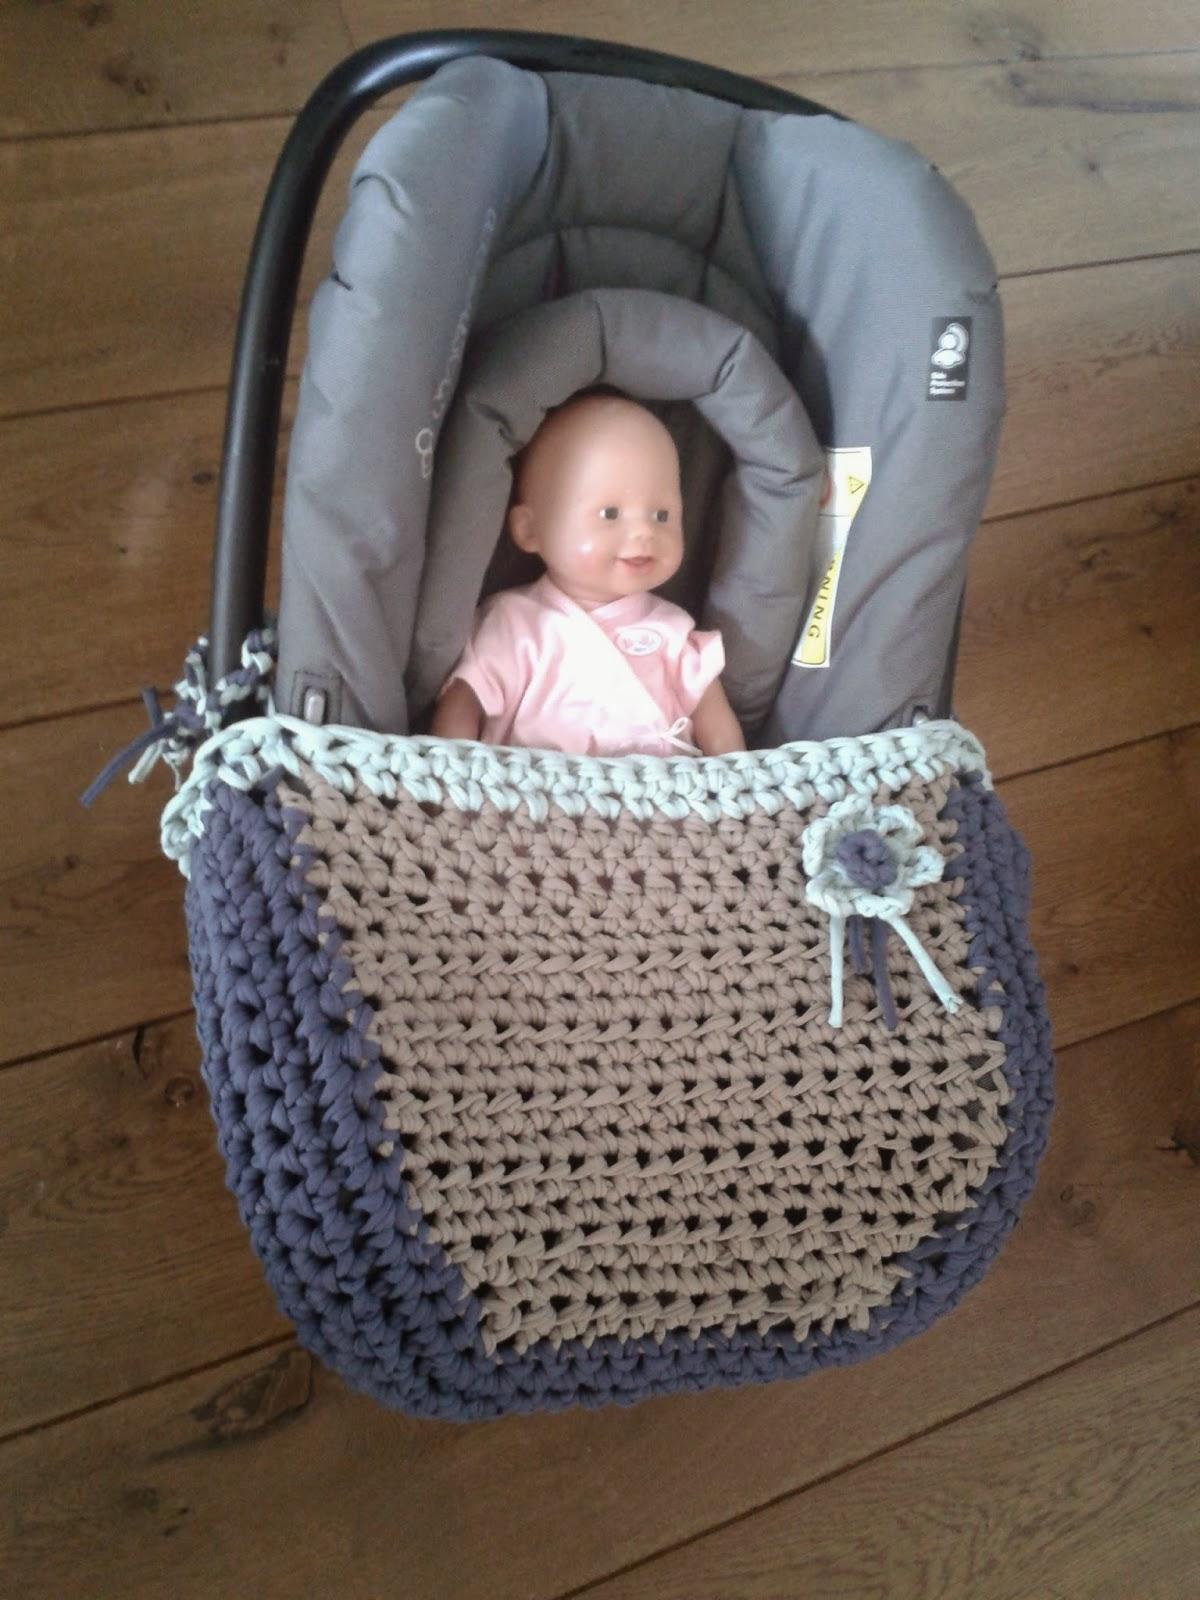 Geliefde Baby Trappelzak Haken At Lq94 Blessingbox